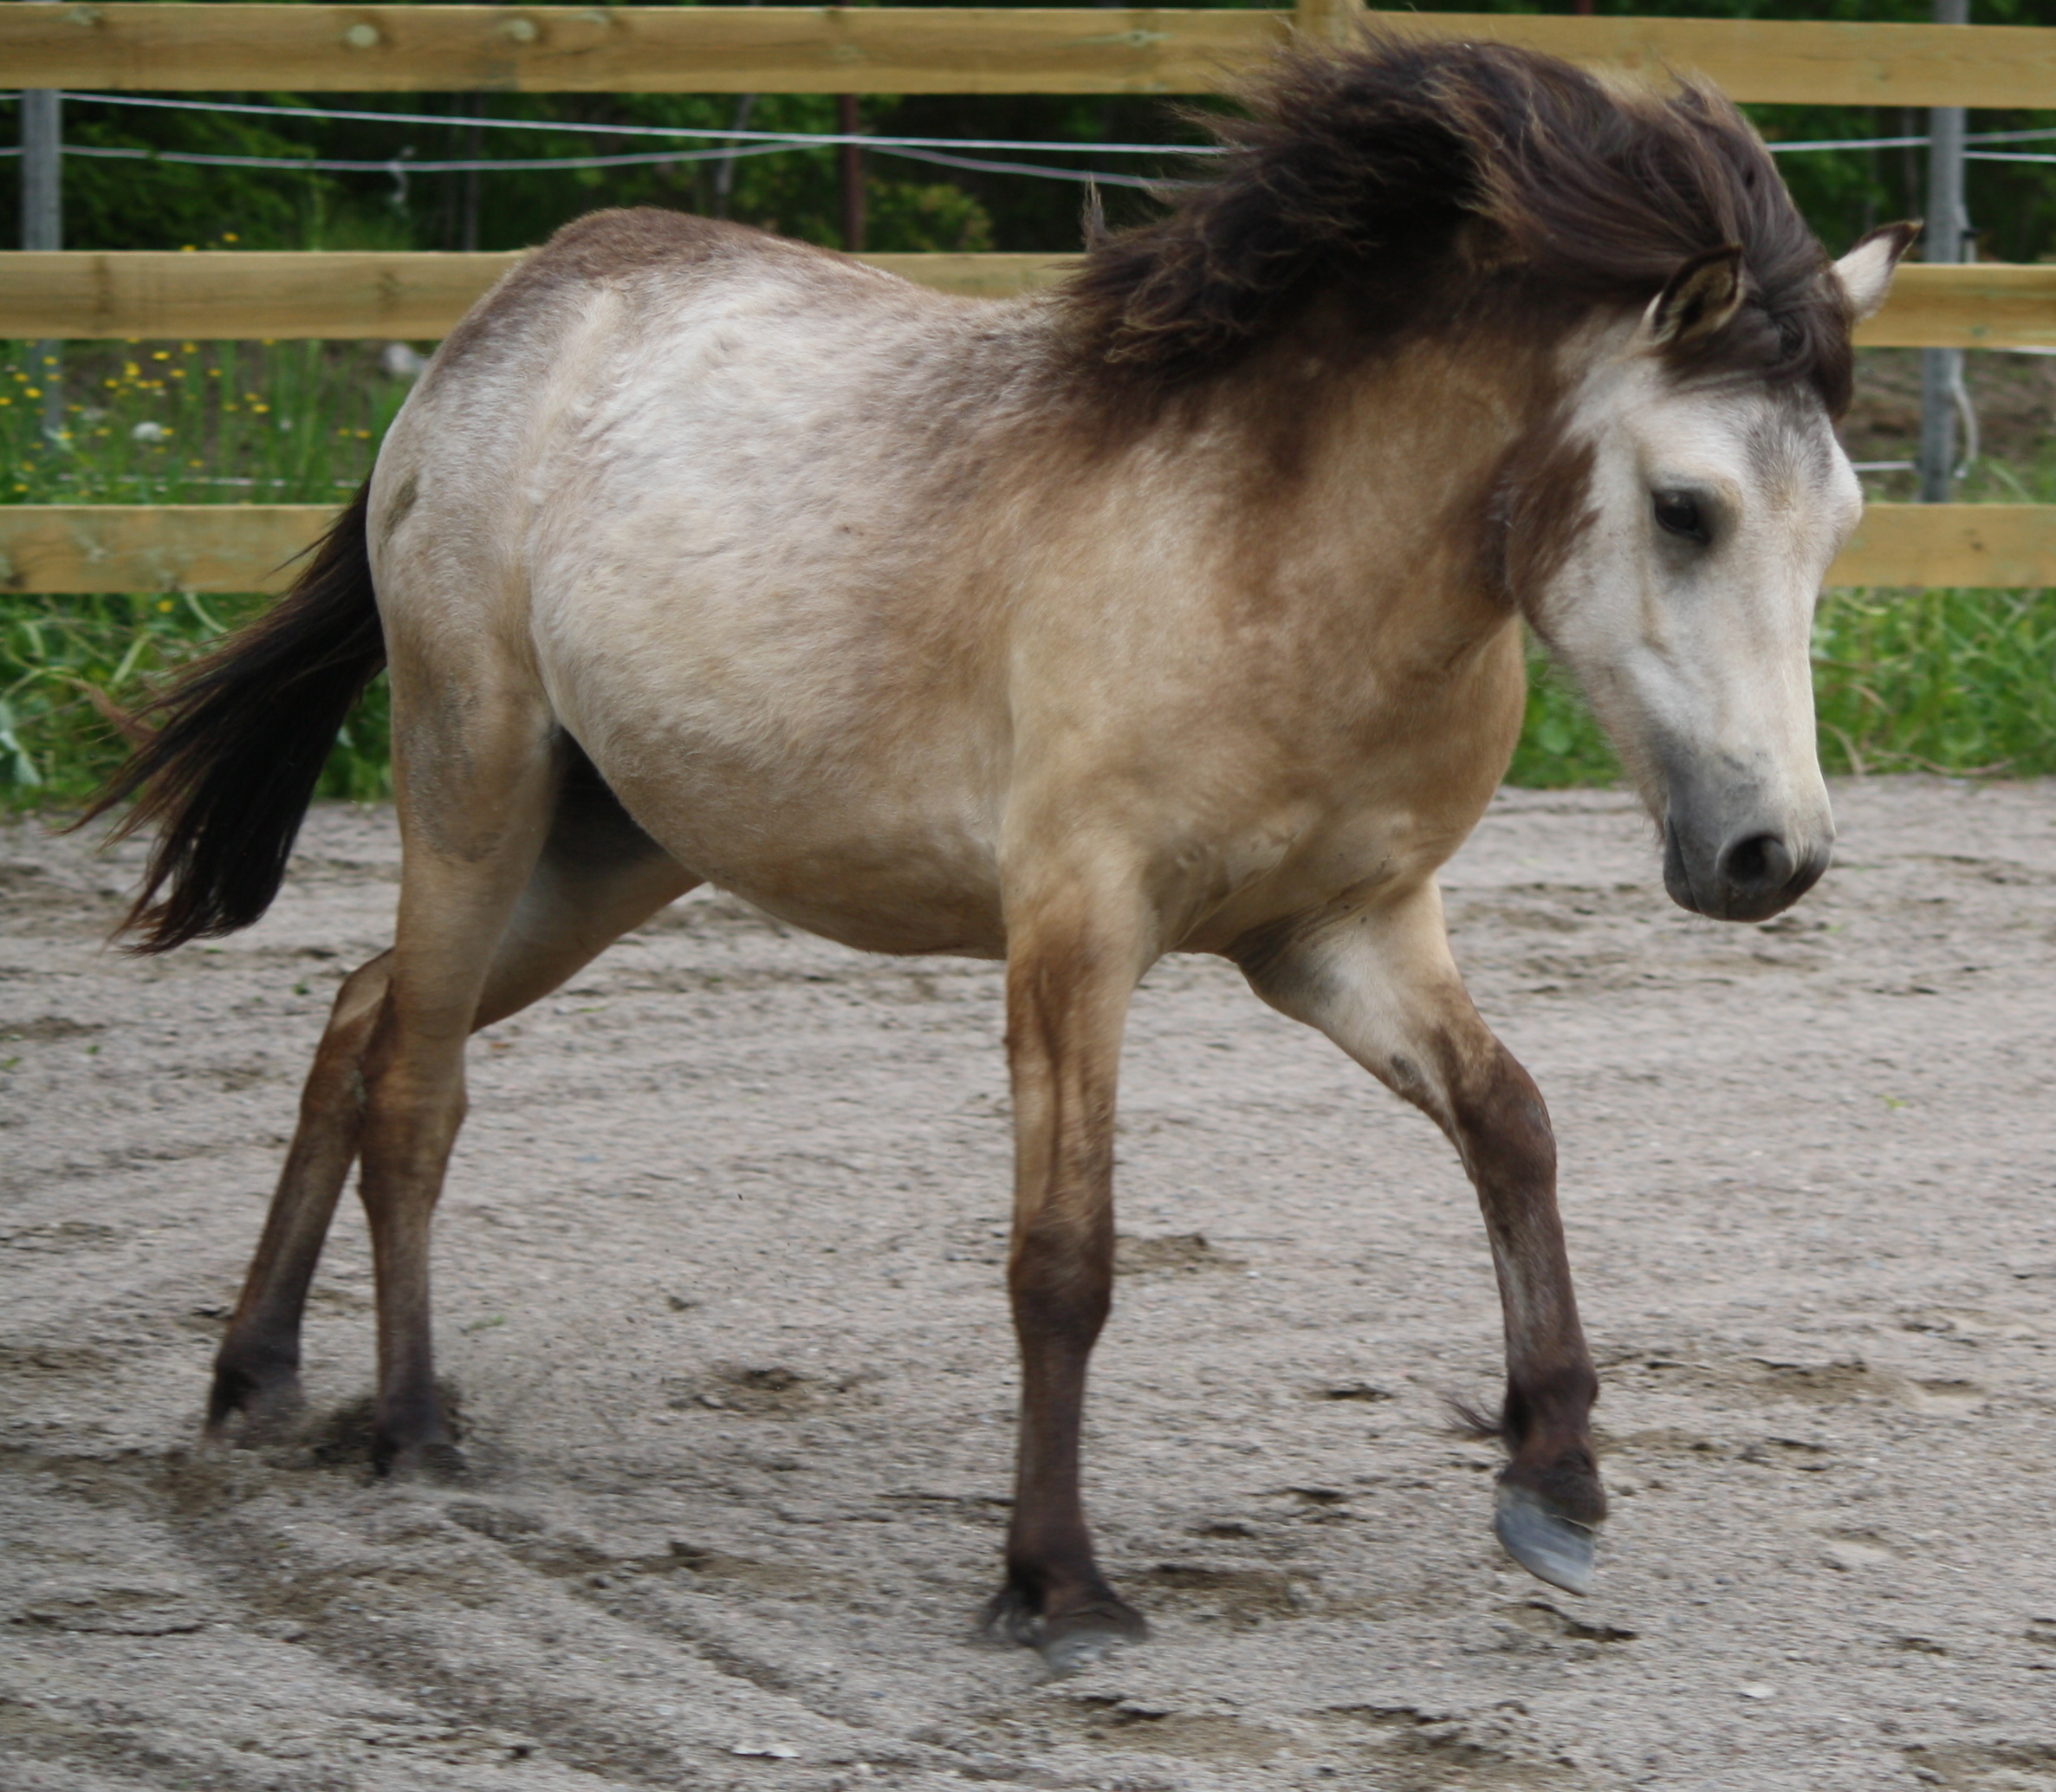 Superfina ponnyer till salu Annonser Säljes Ponnytrav iFokus